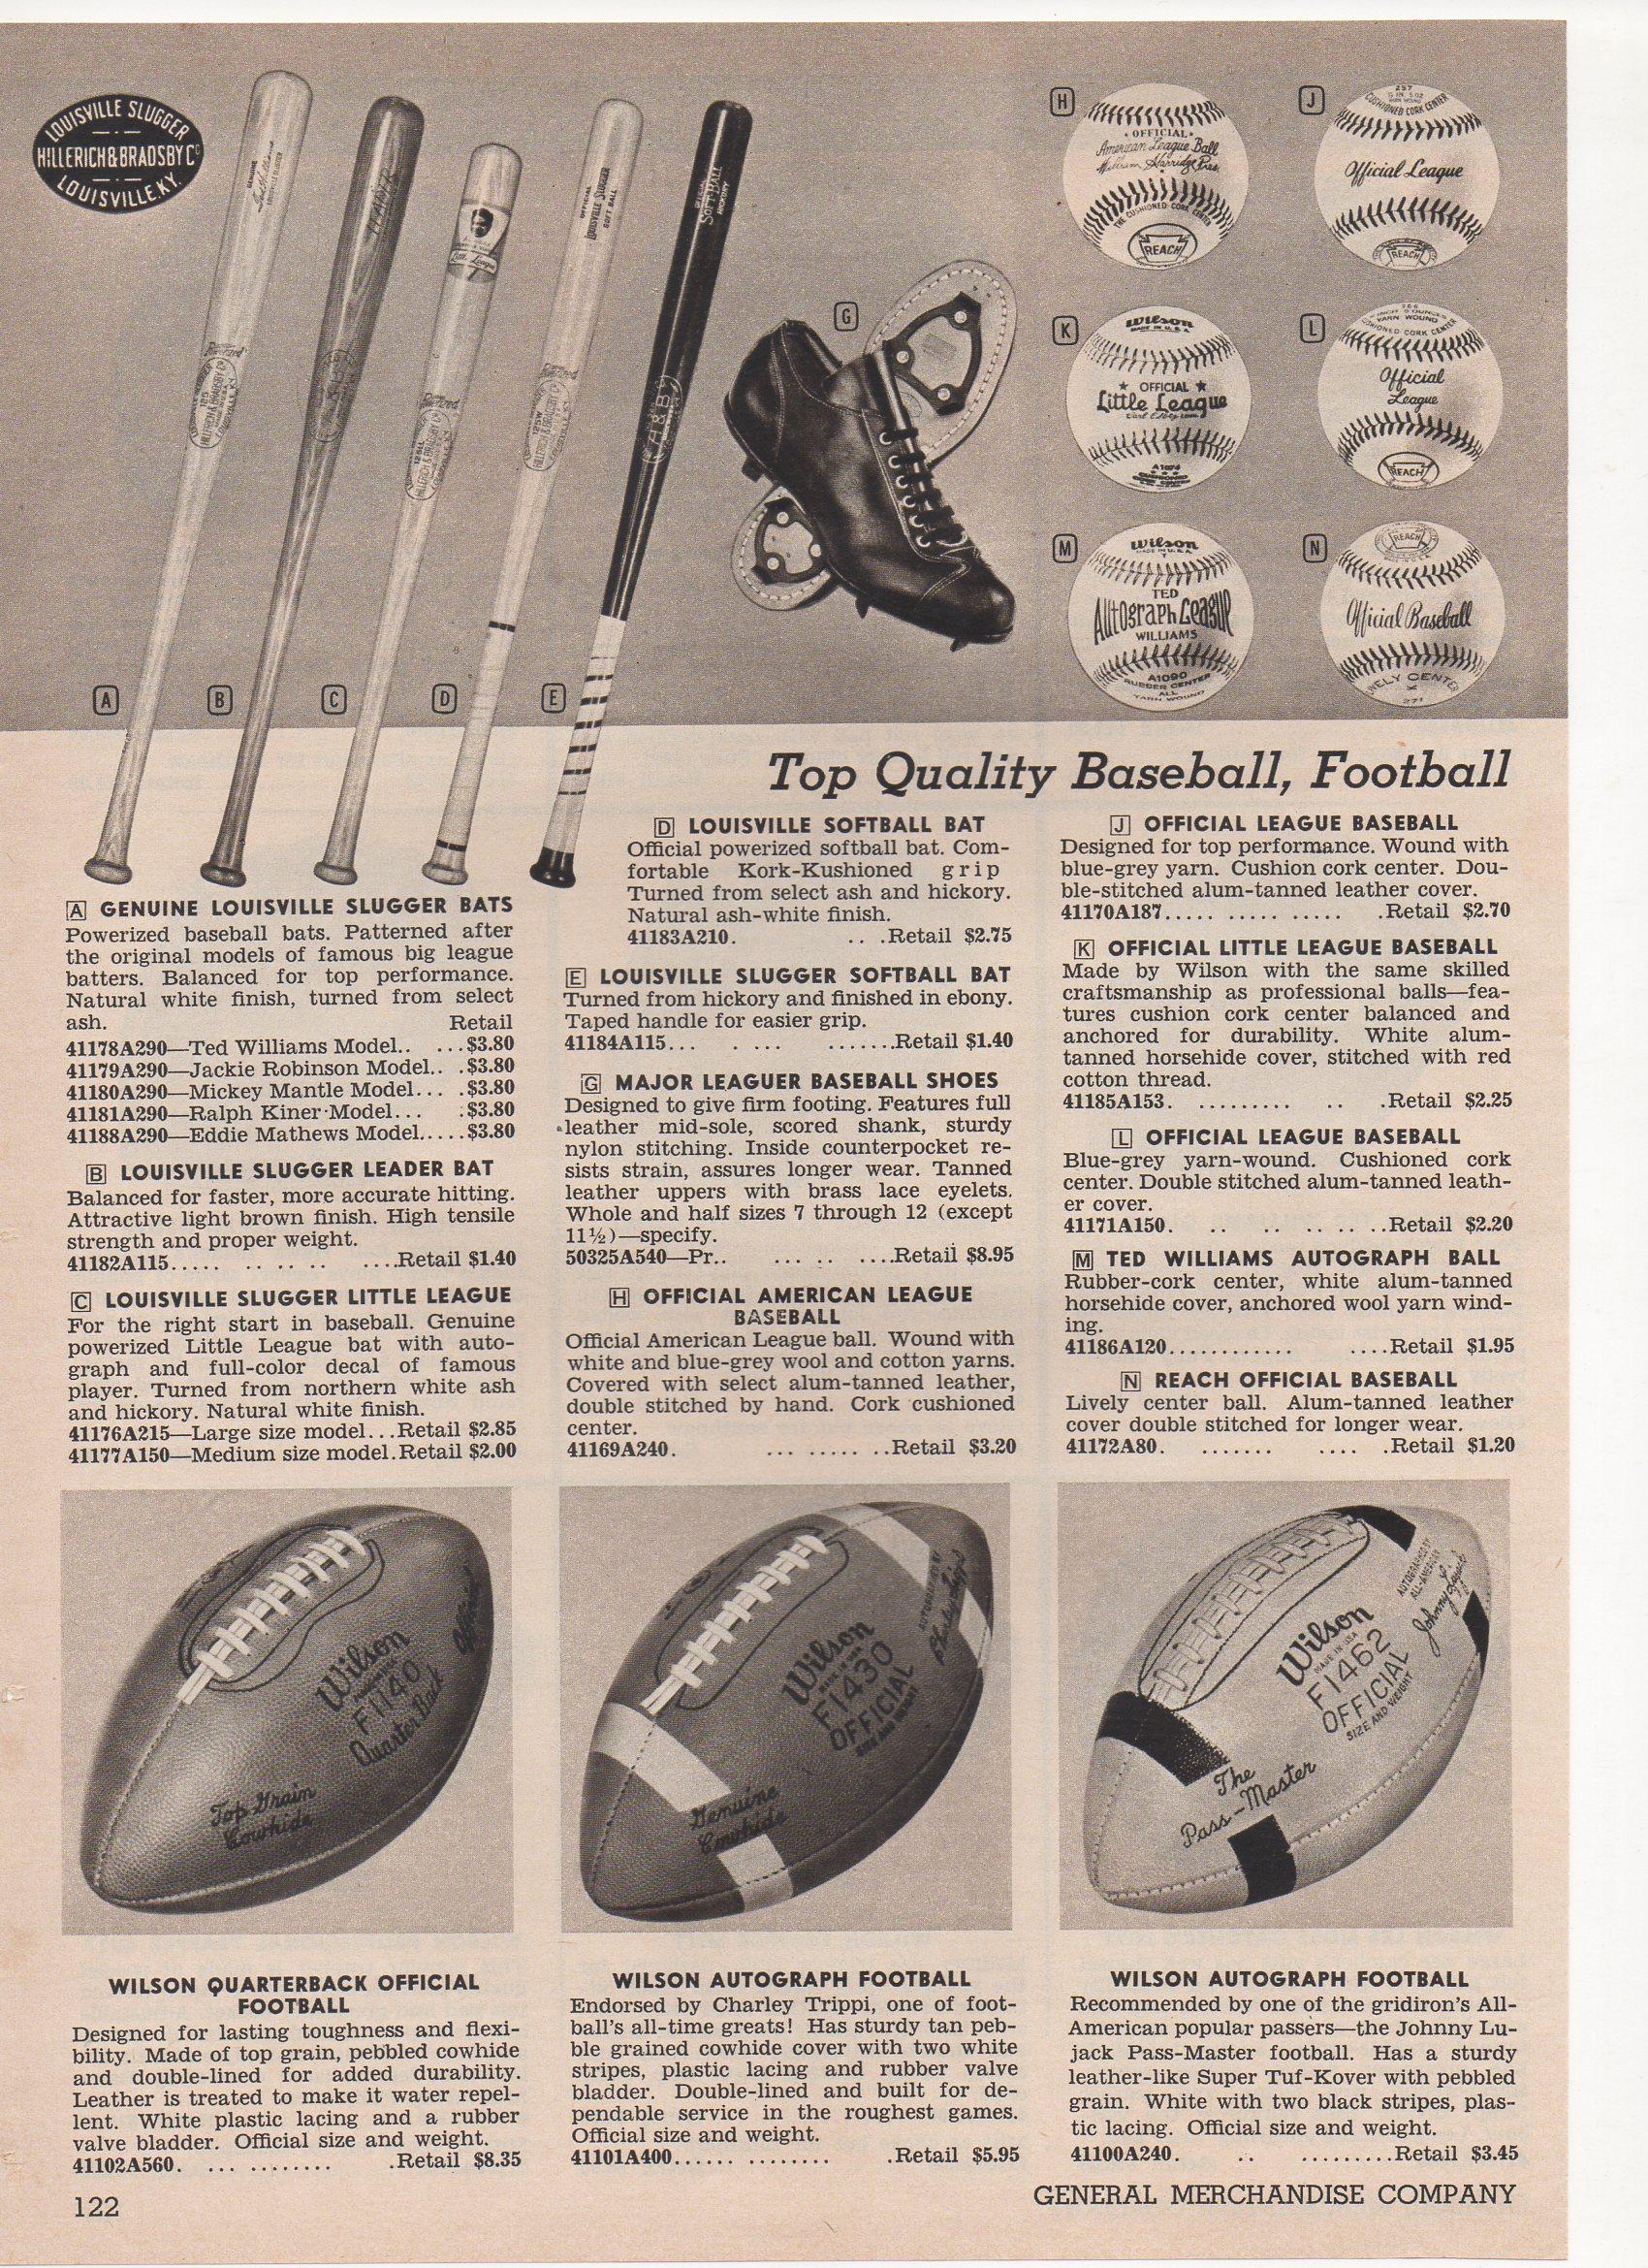 1954 general merchandise company